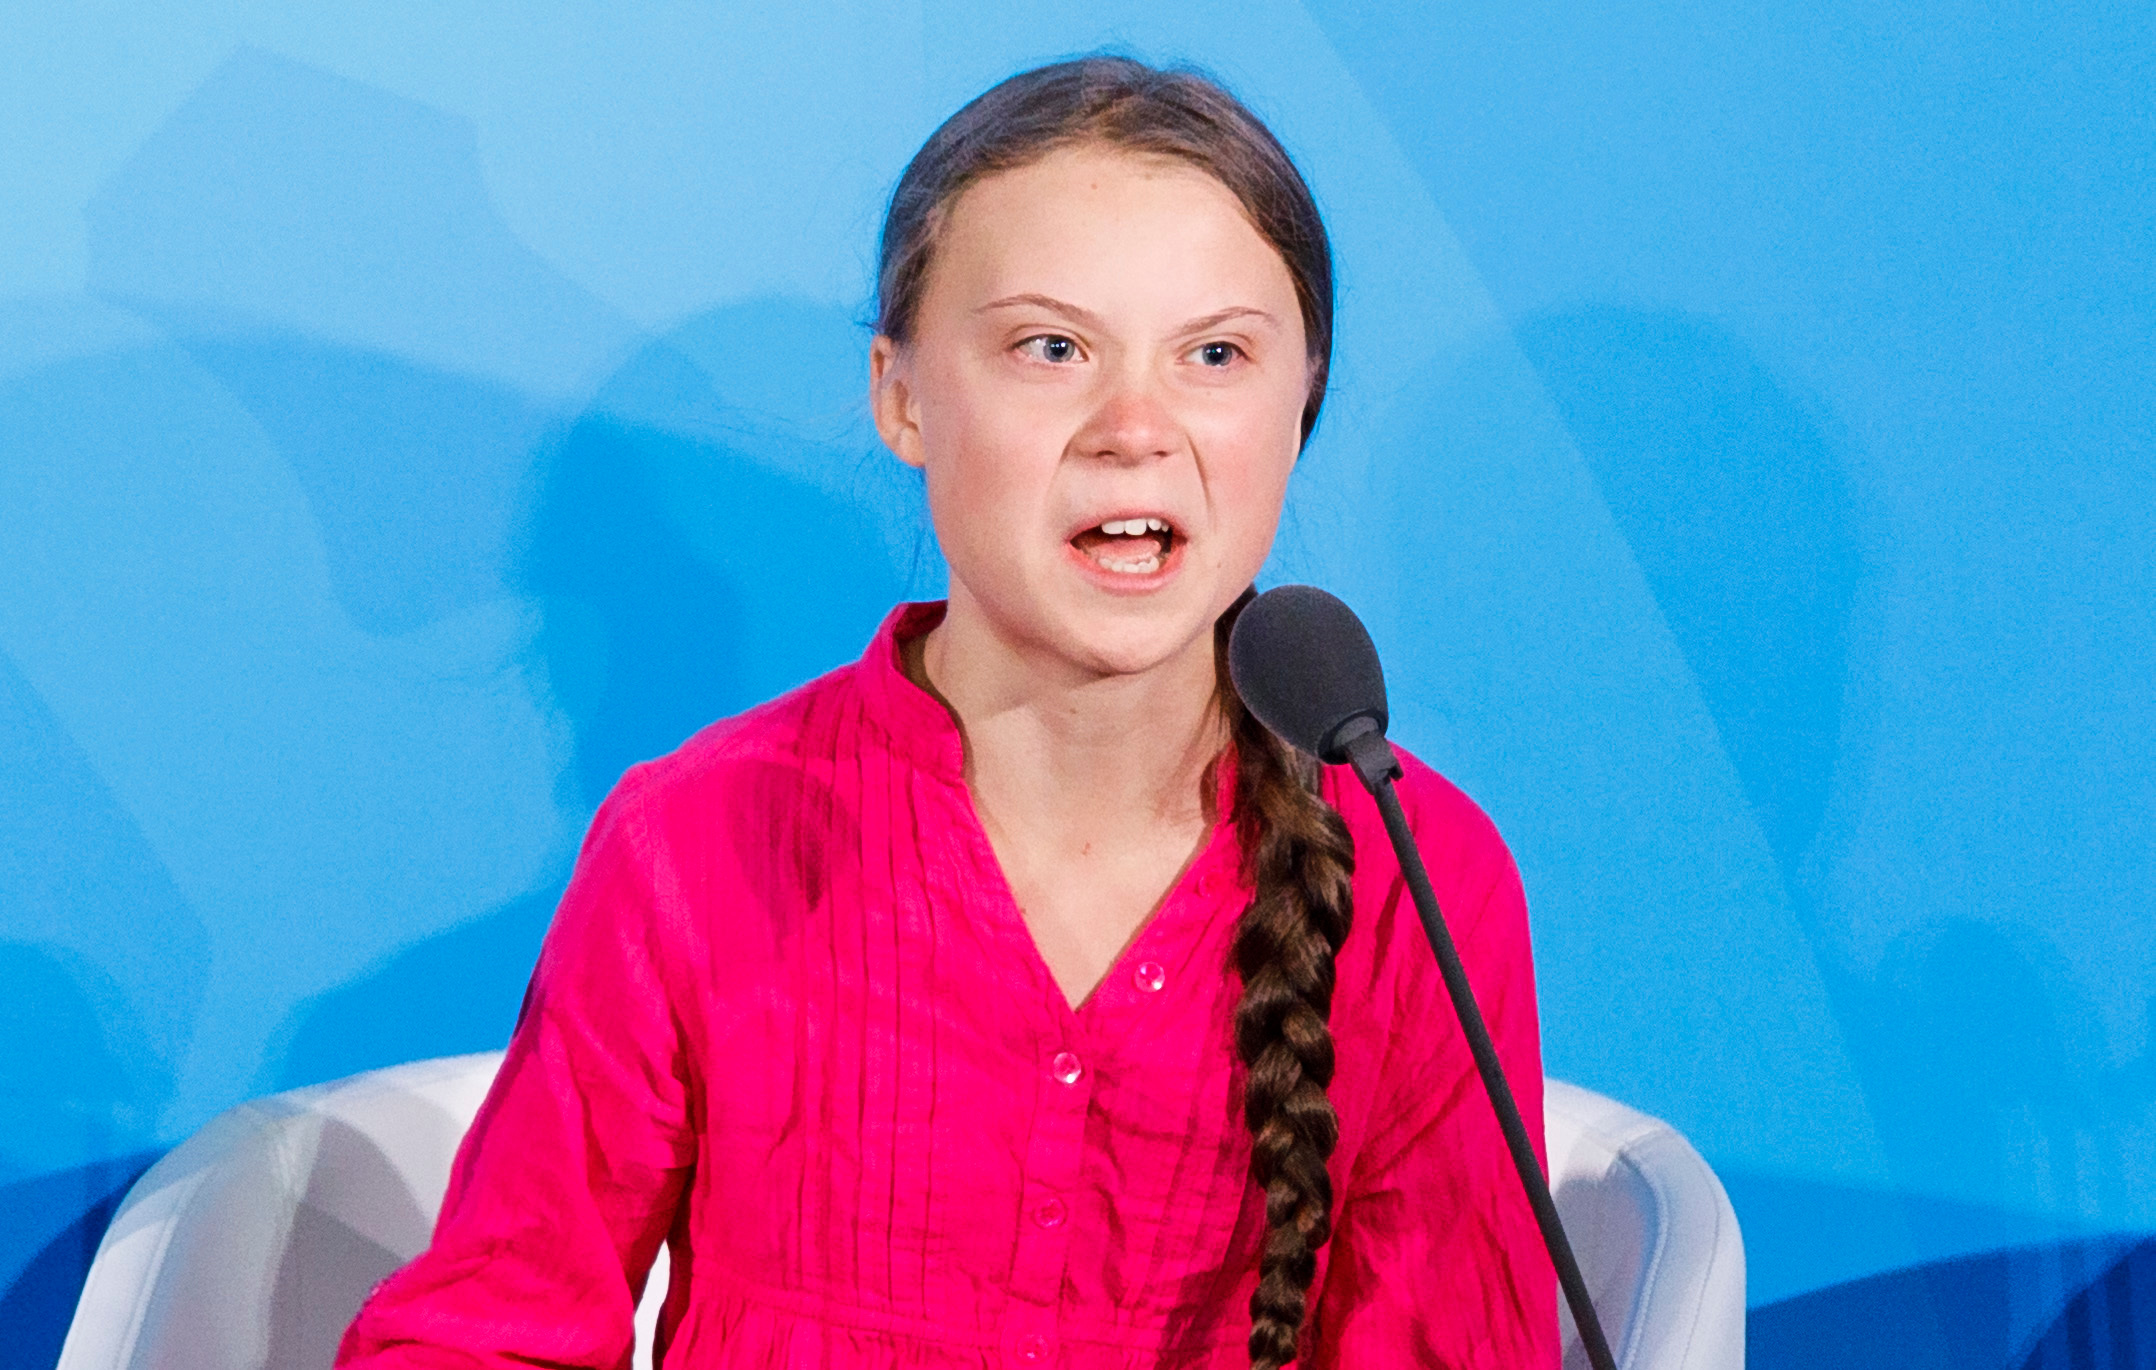 Greta Thunberg UN Climate Speech Goes Viral